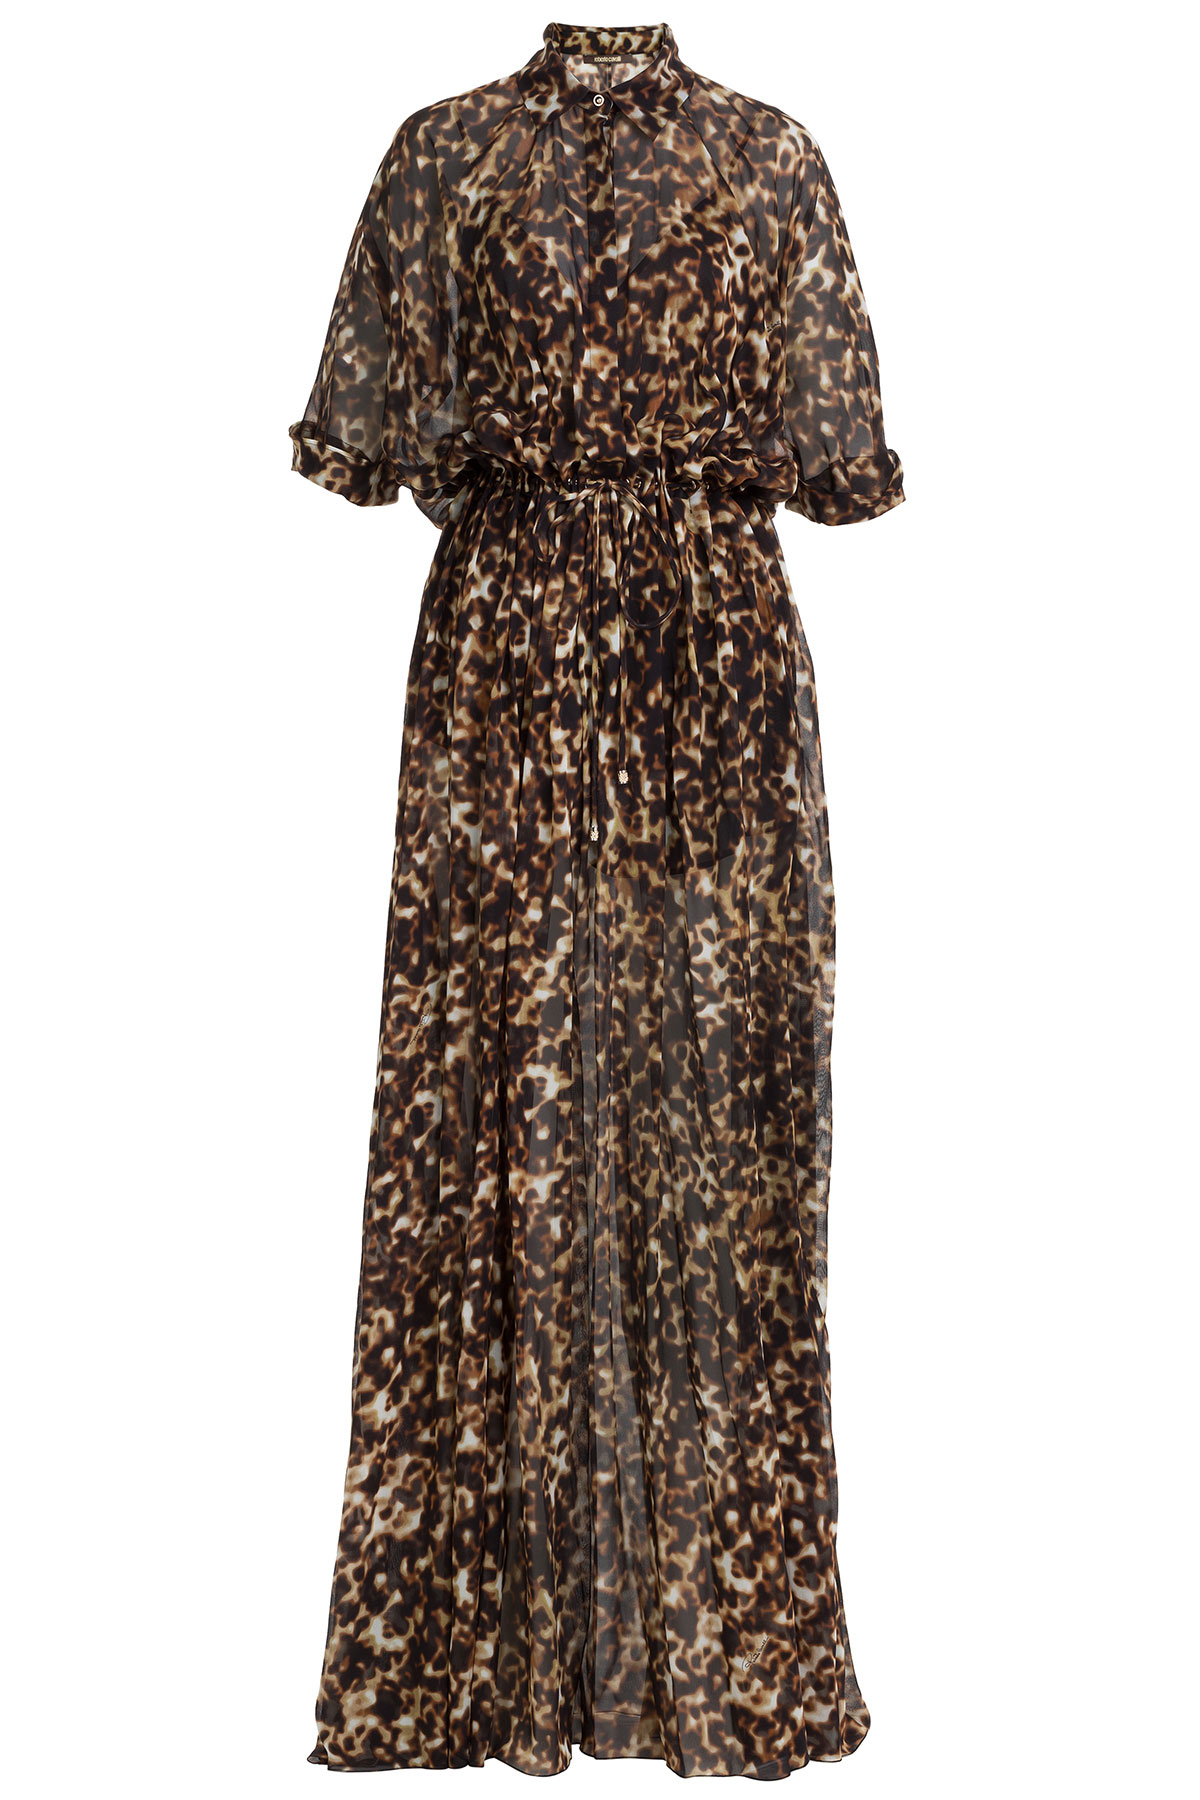 Roberto cavalli Printed Silk Chiffon Maxi Dress - Animal Prints | Lyst